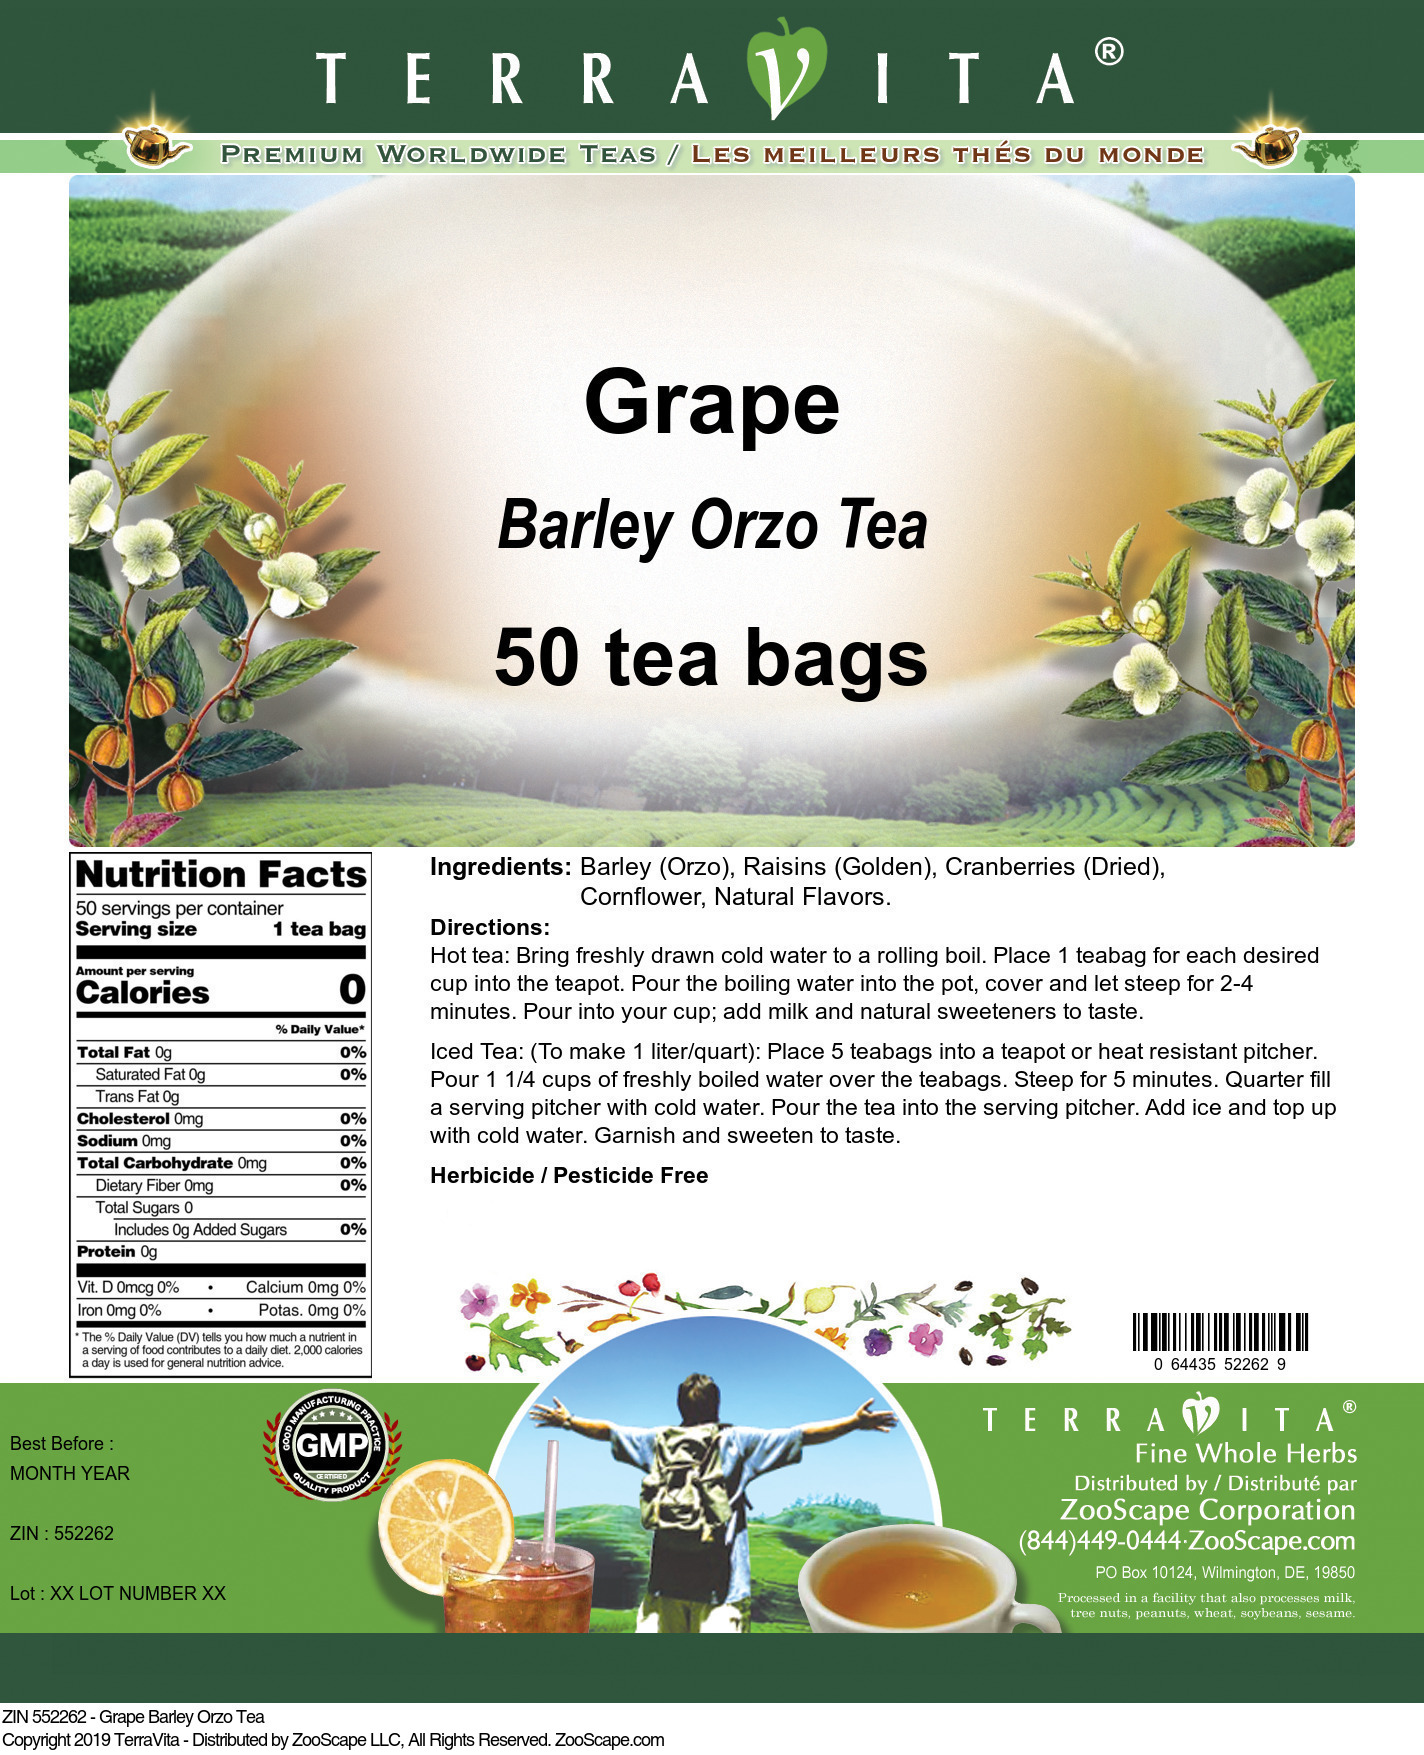 Grape Barley Orzo